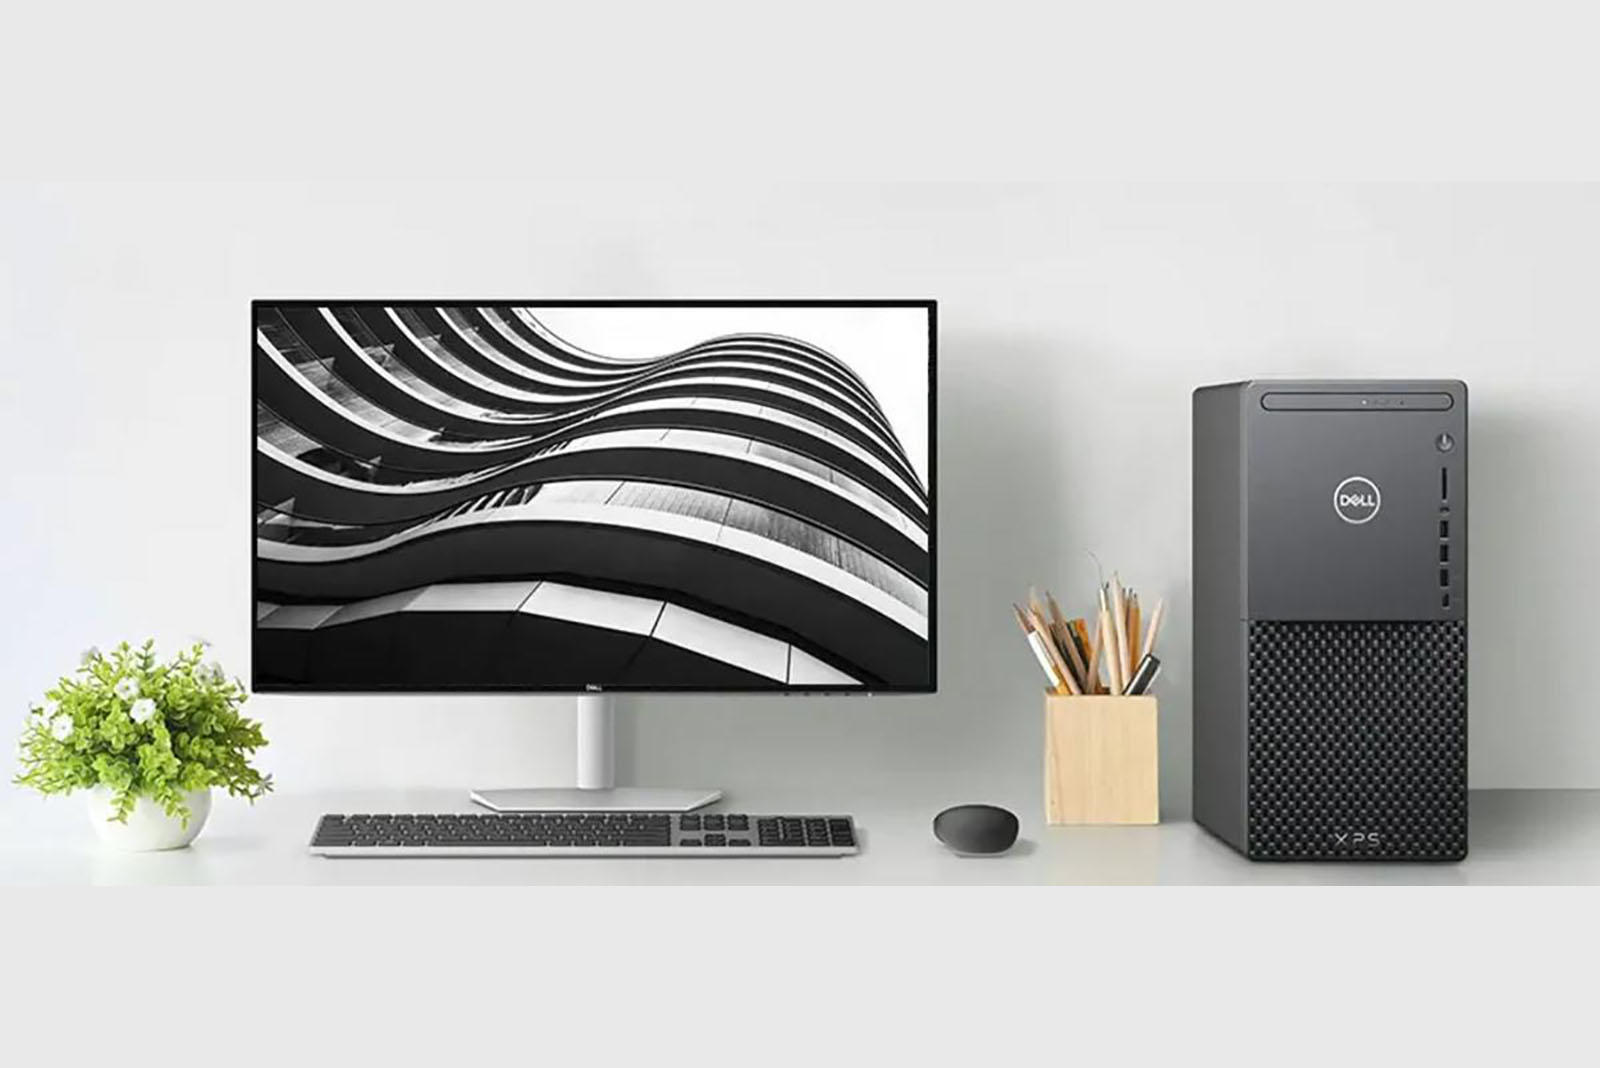 black-friday-2020-dell-xps-tower-desktop-pc-deal-sale.jpg